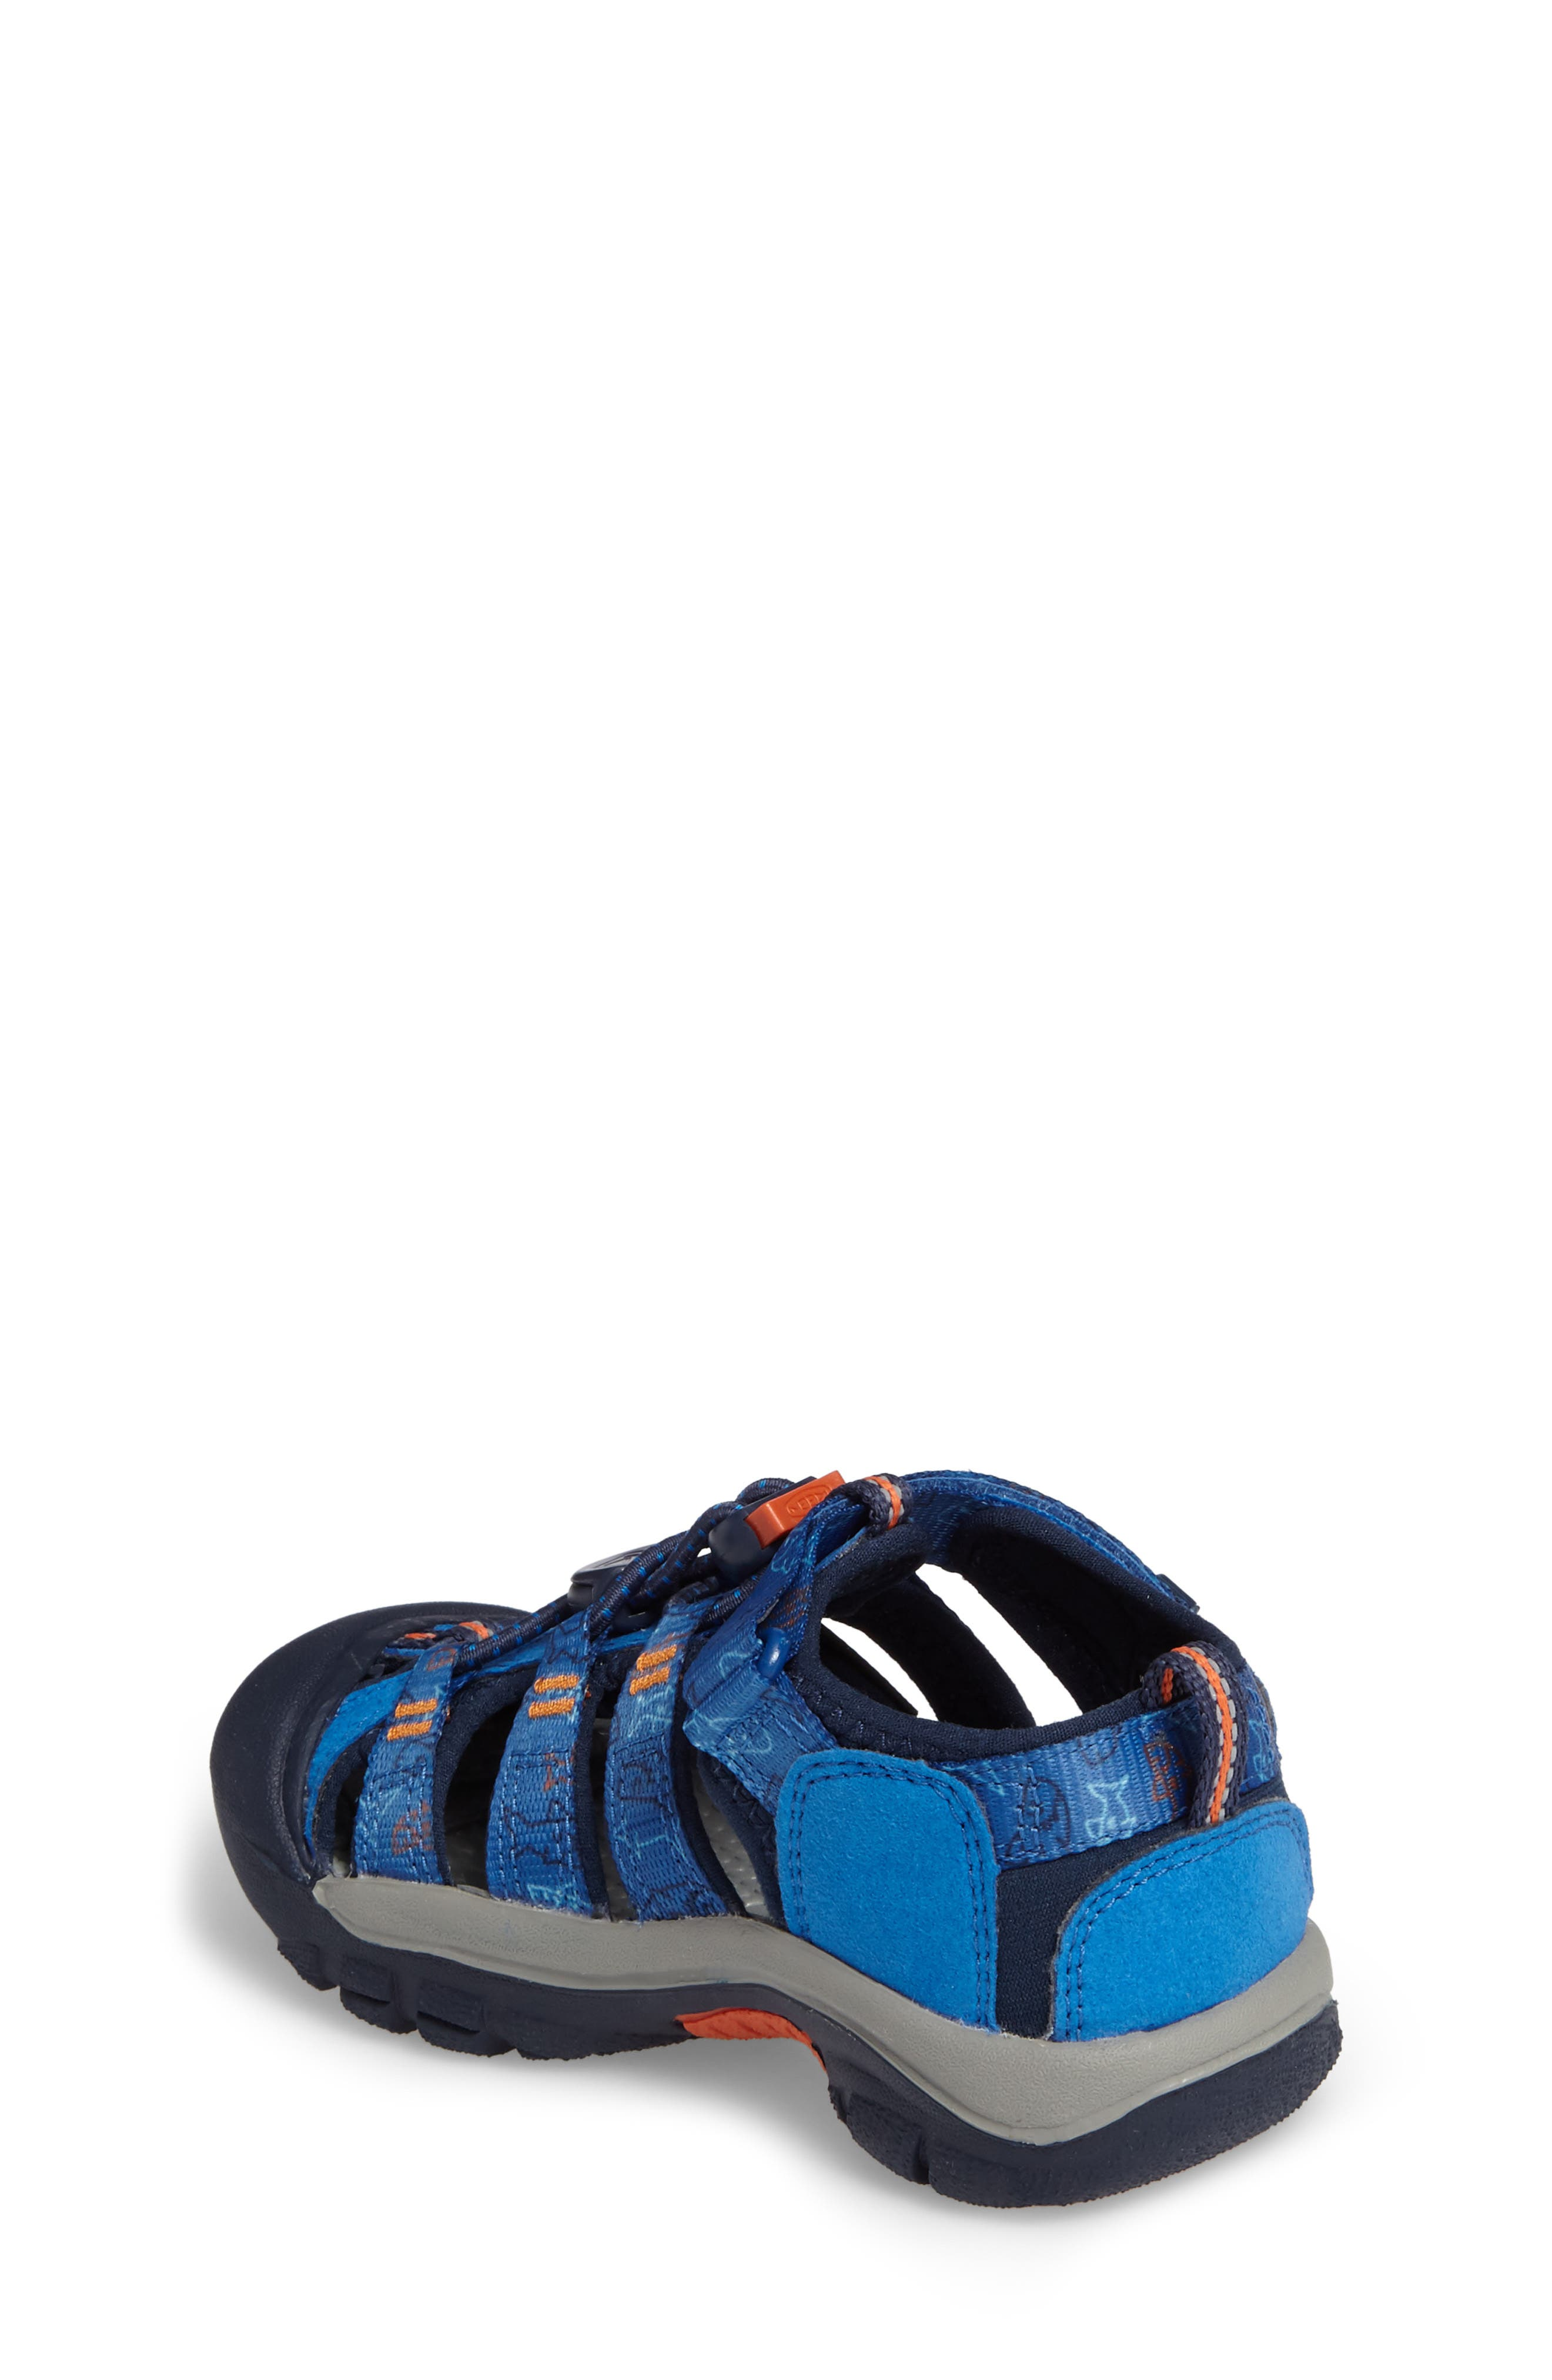 'Newport H2' Water Friendly Sandal,                             Alternate thumbnail 90, color,